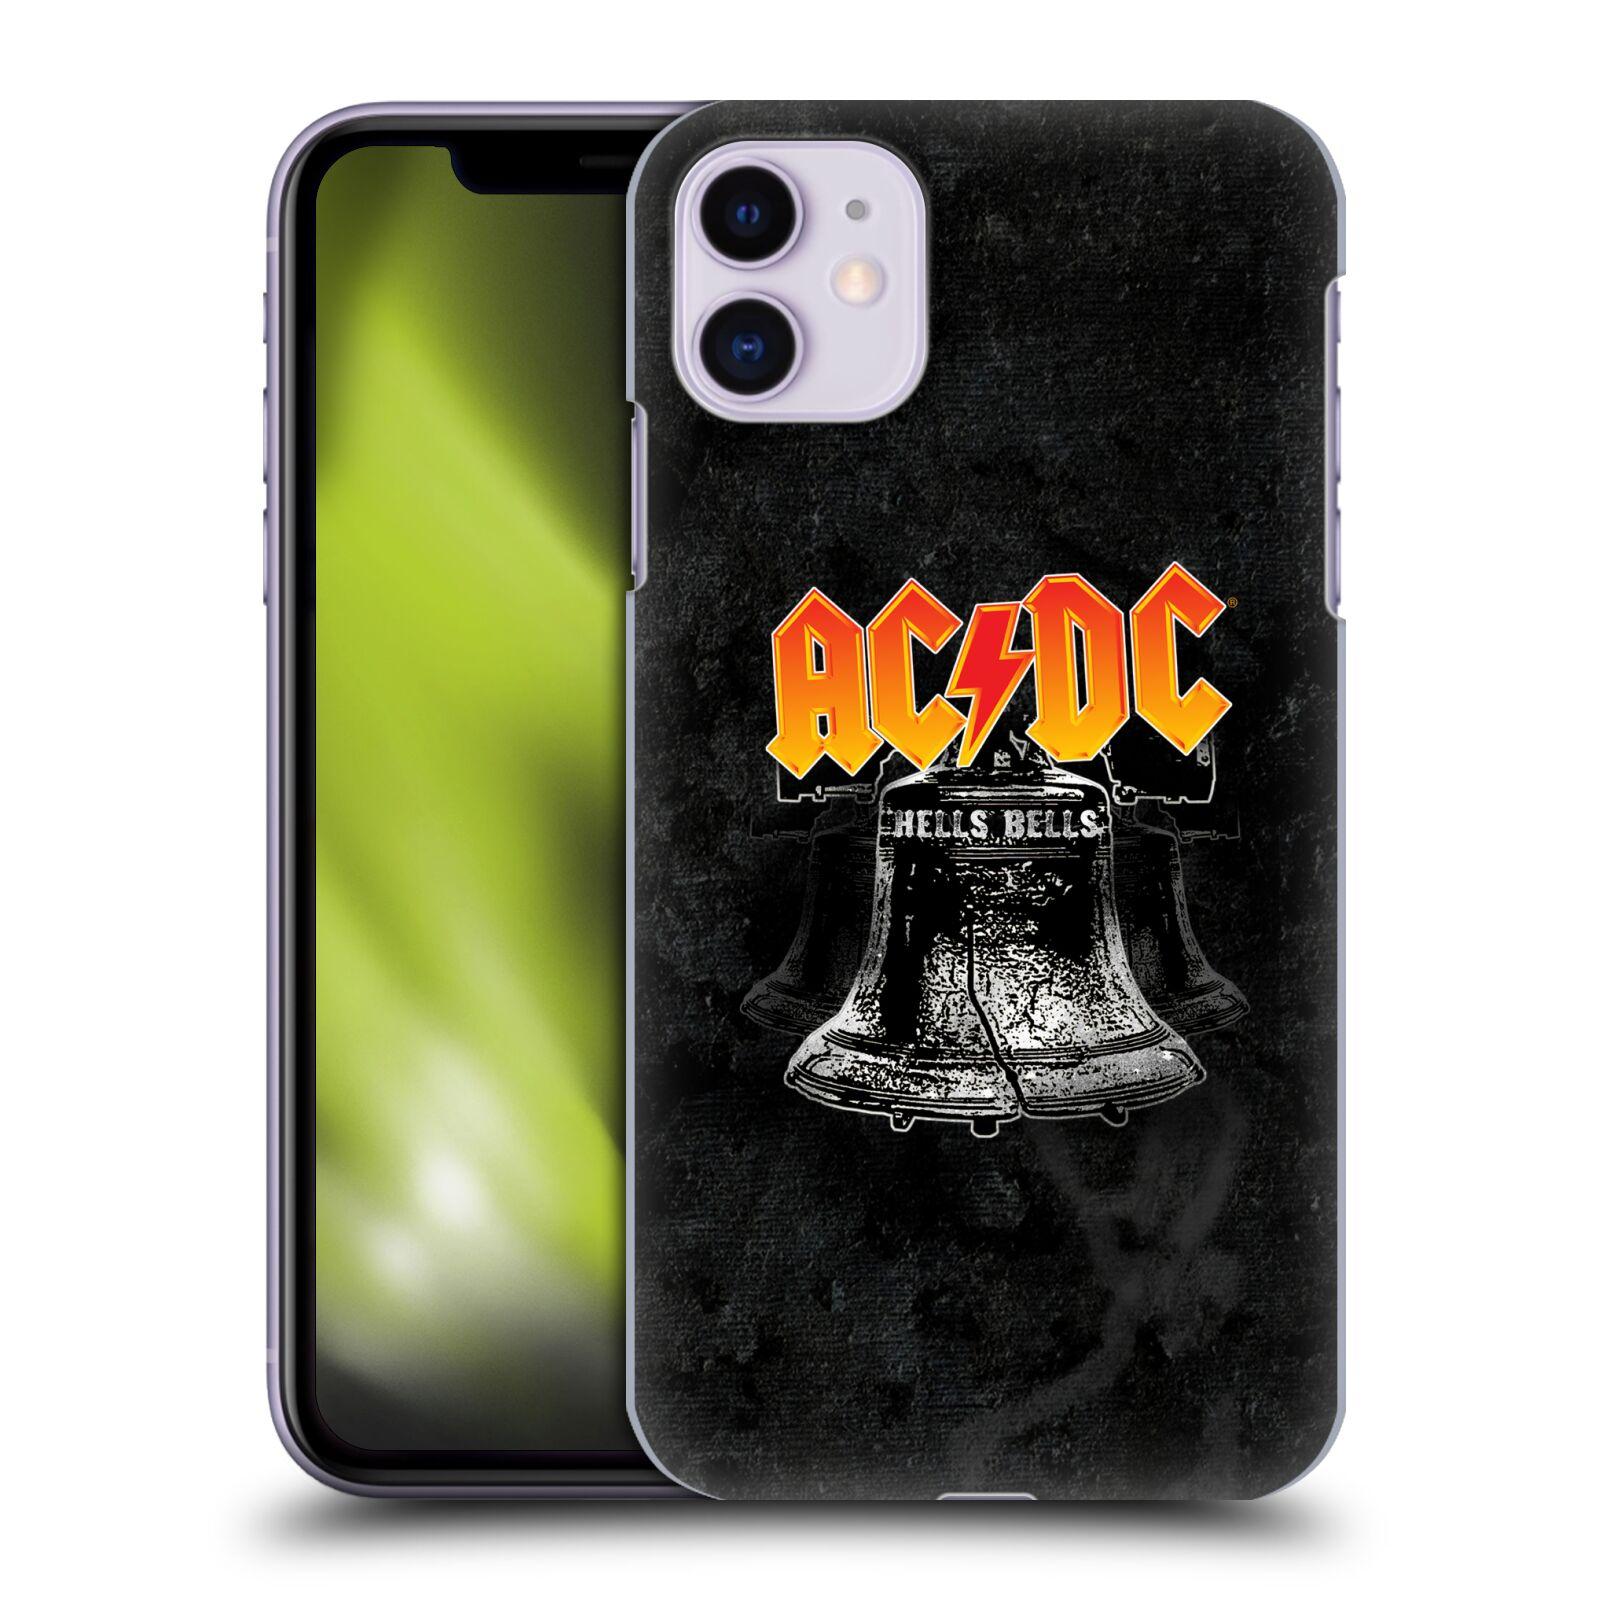 Plastové pouzdro na mobil Apple iPhone 11 - Head Case - AC/DC Hells Bells